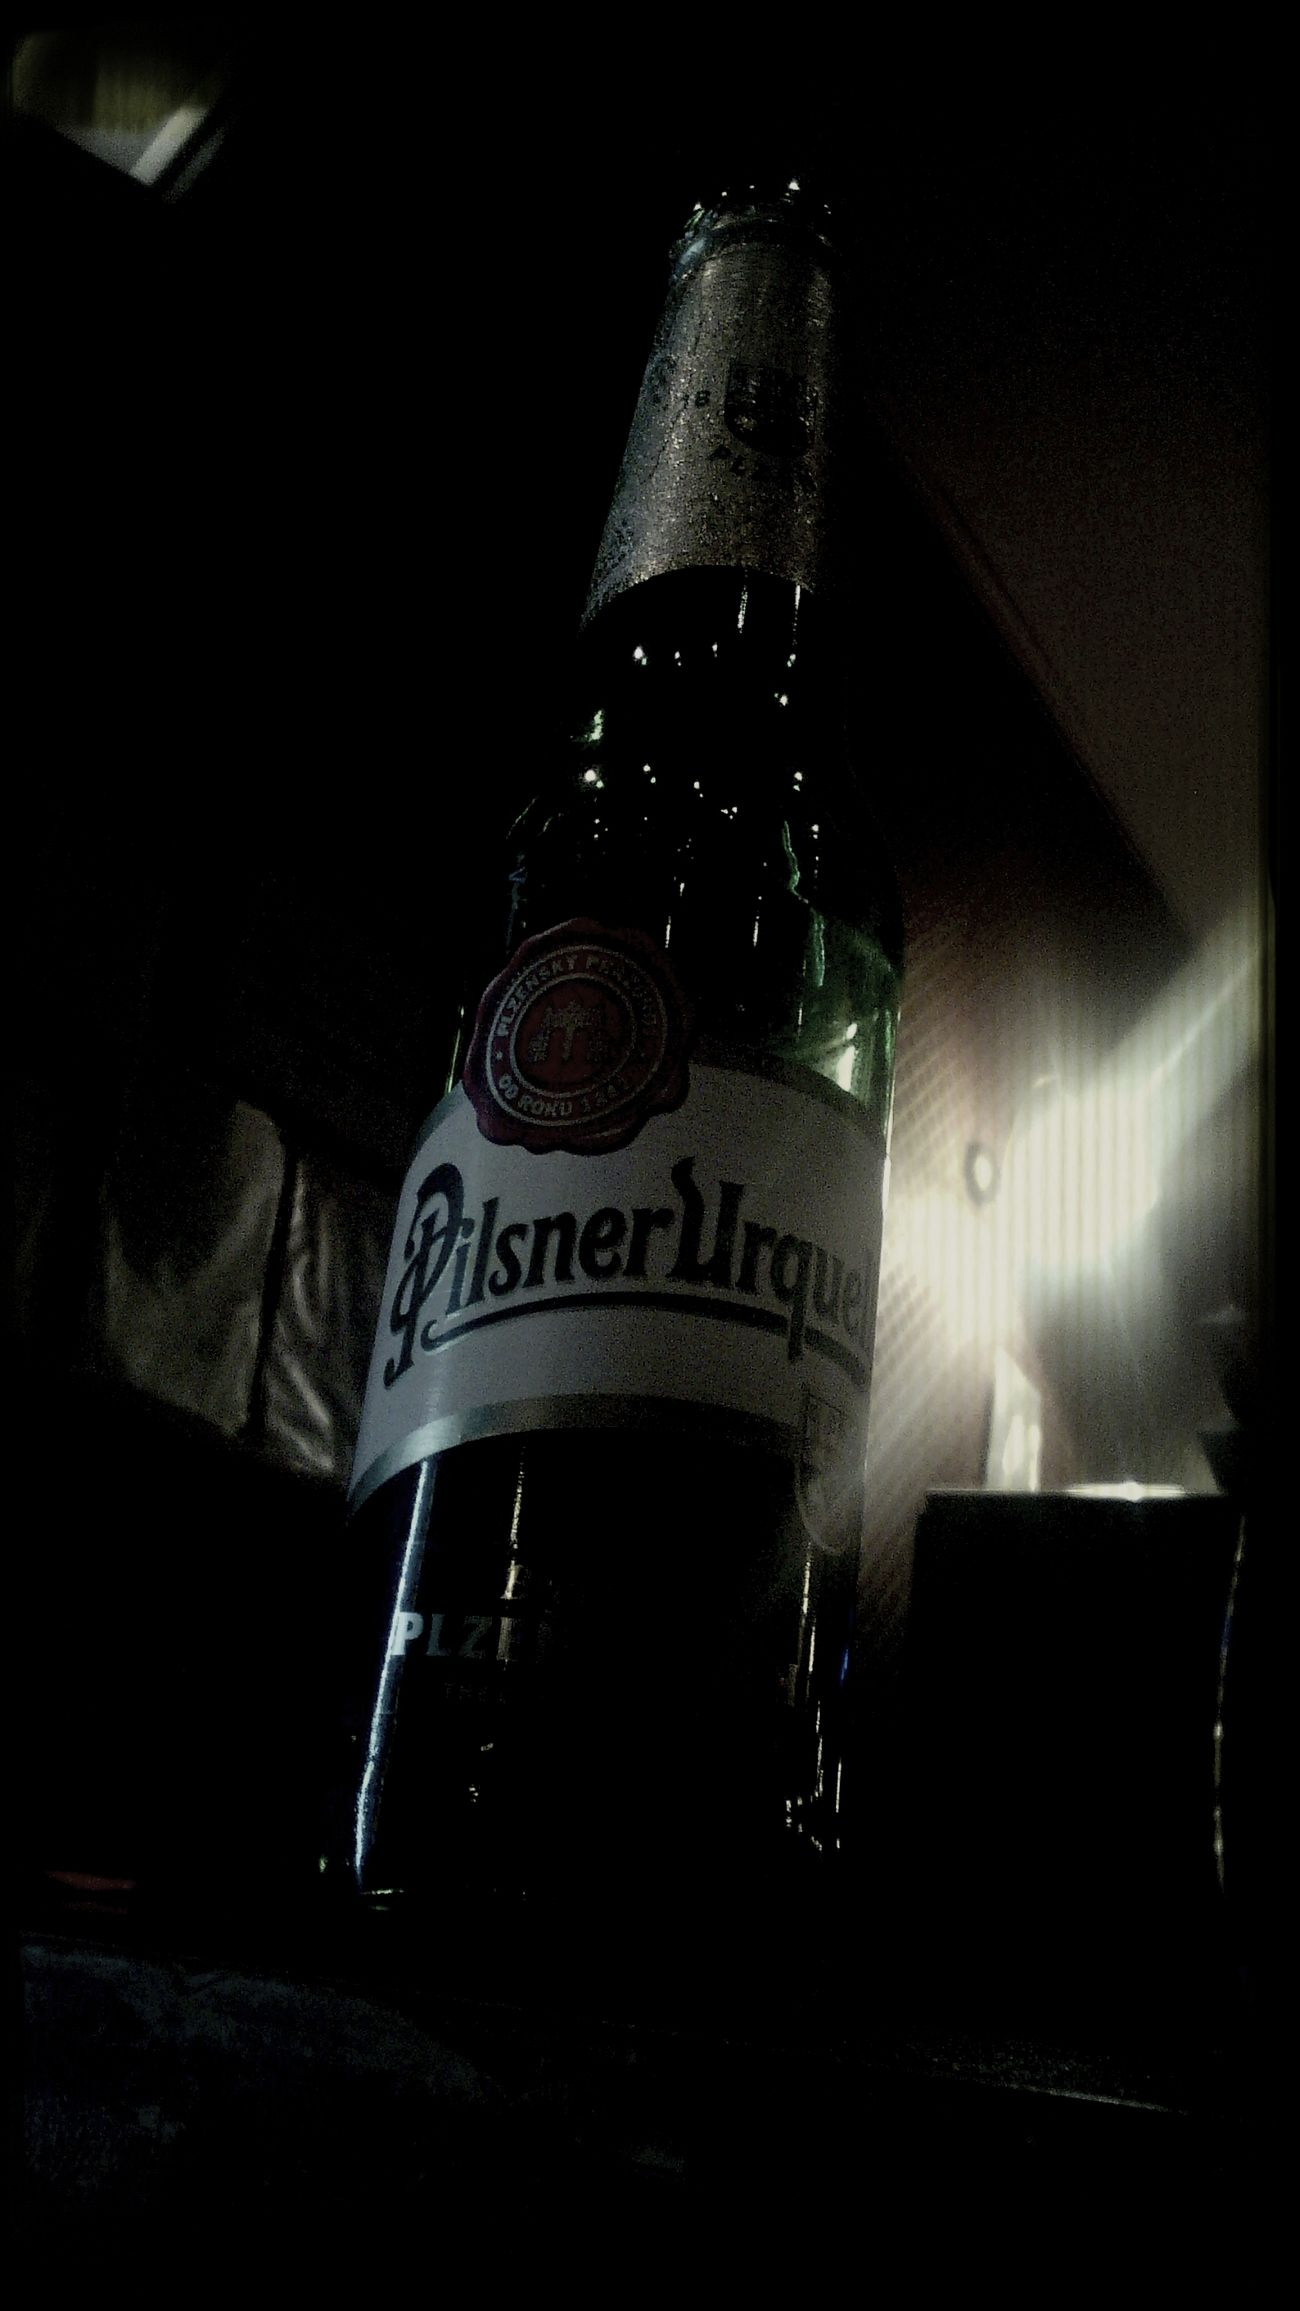 Pilsner Urquell Relaxing Listening To Music In Bolero